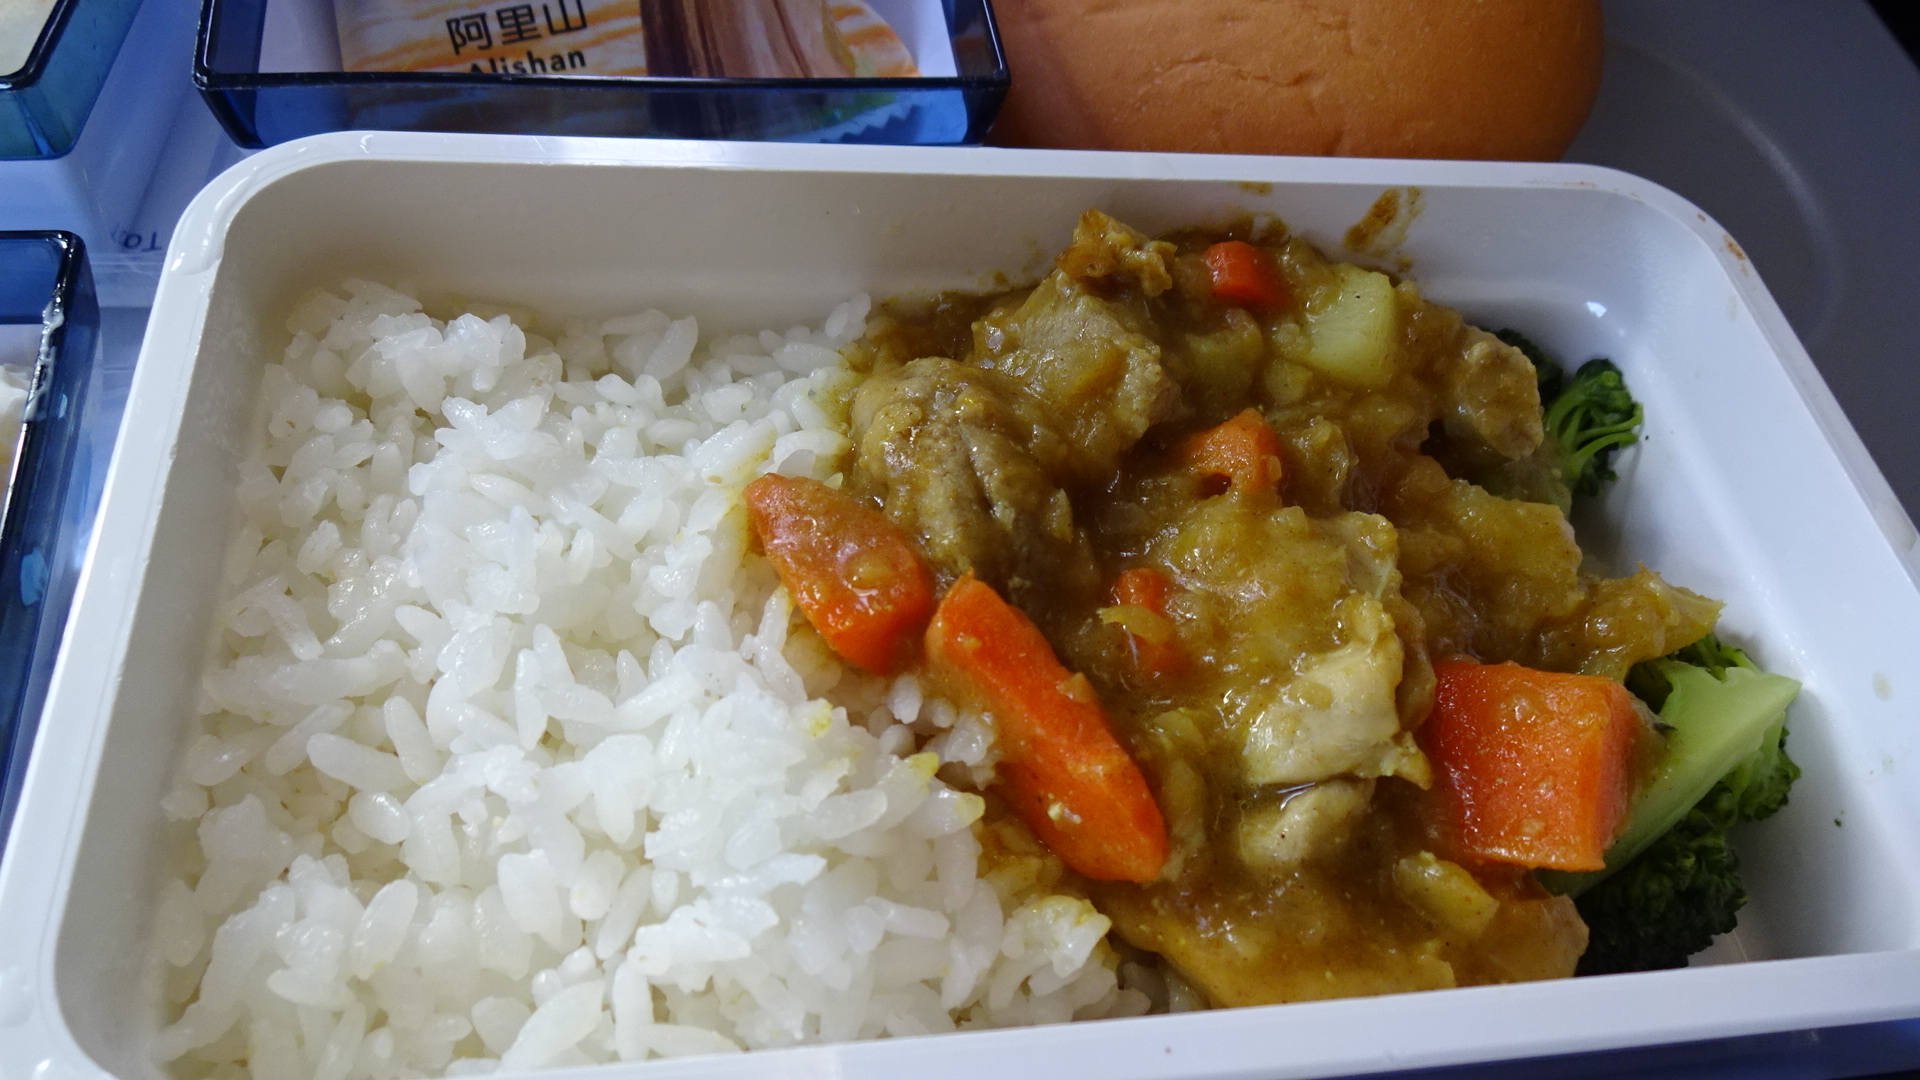 CI106 10APR15 チャイナエアライン エコノミー機内食